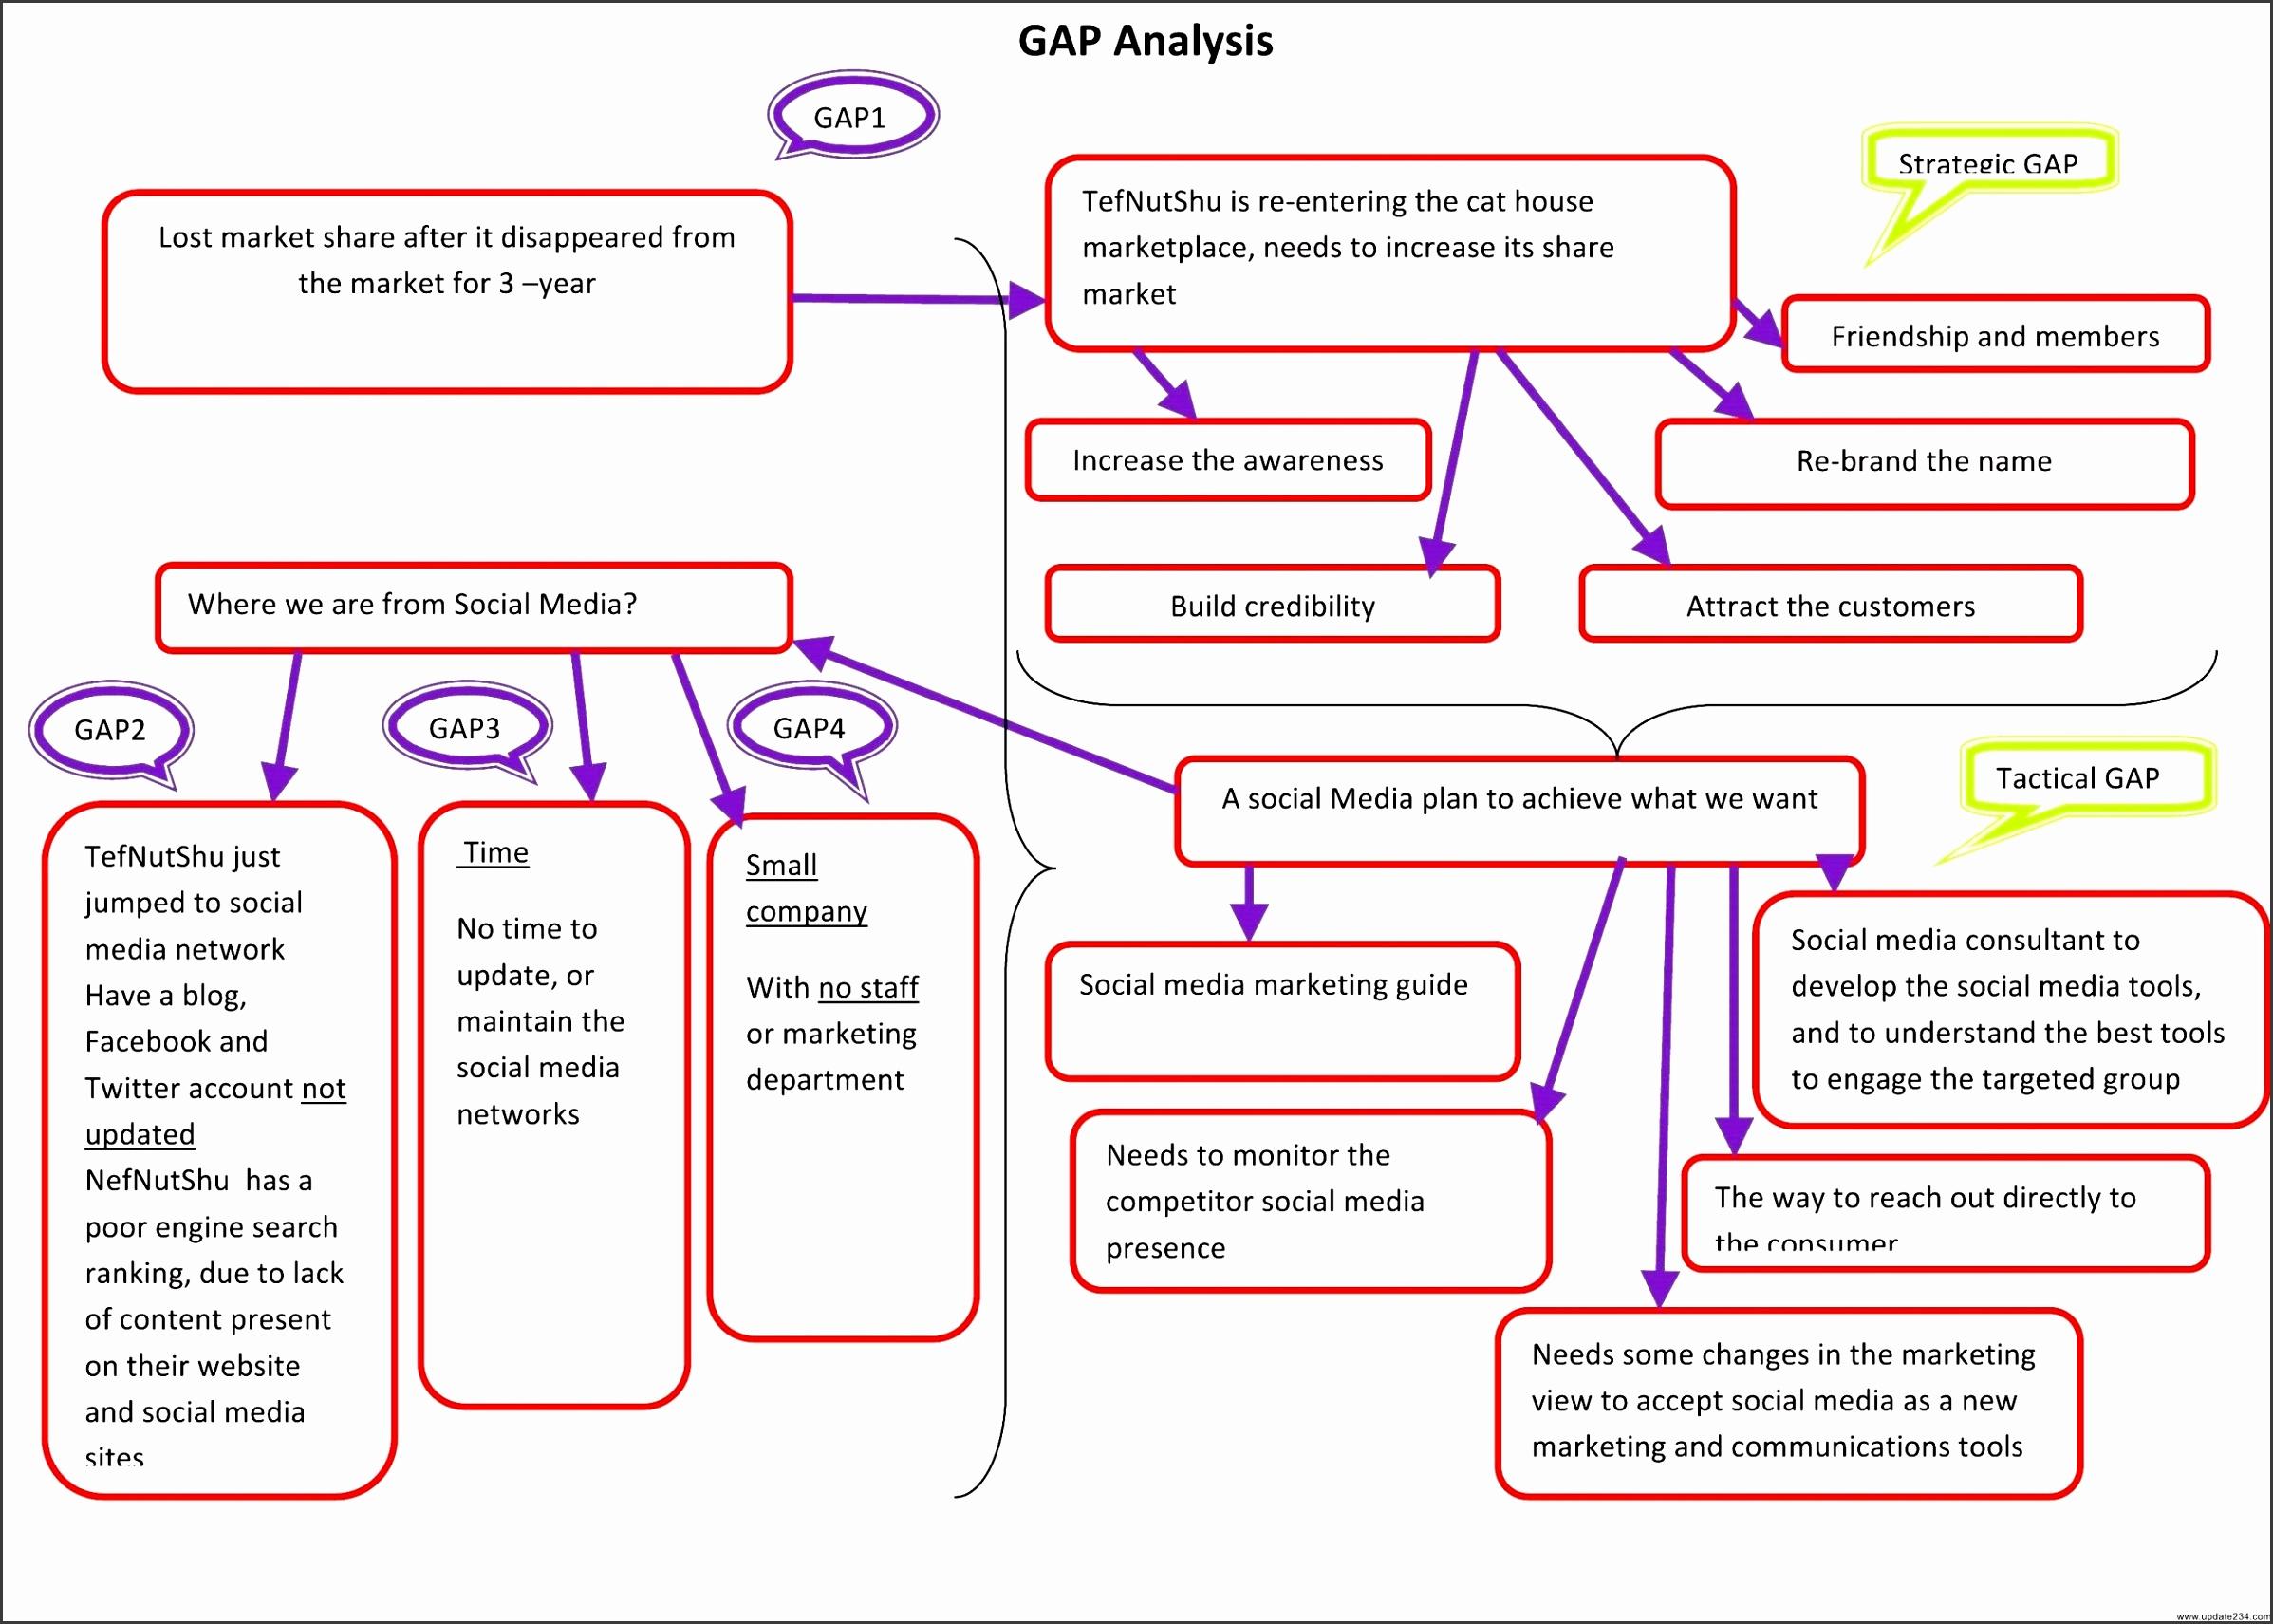 Free Gap Analysis Tools And Templates